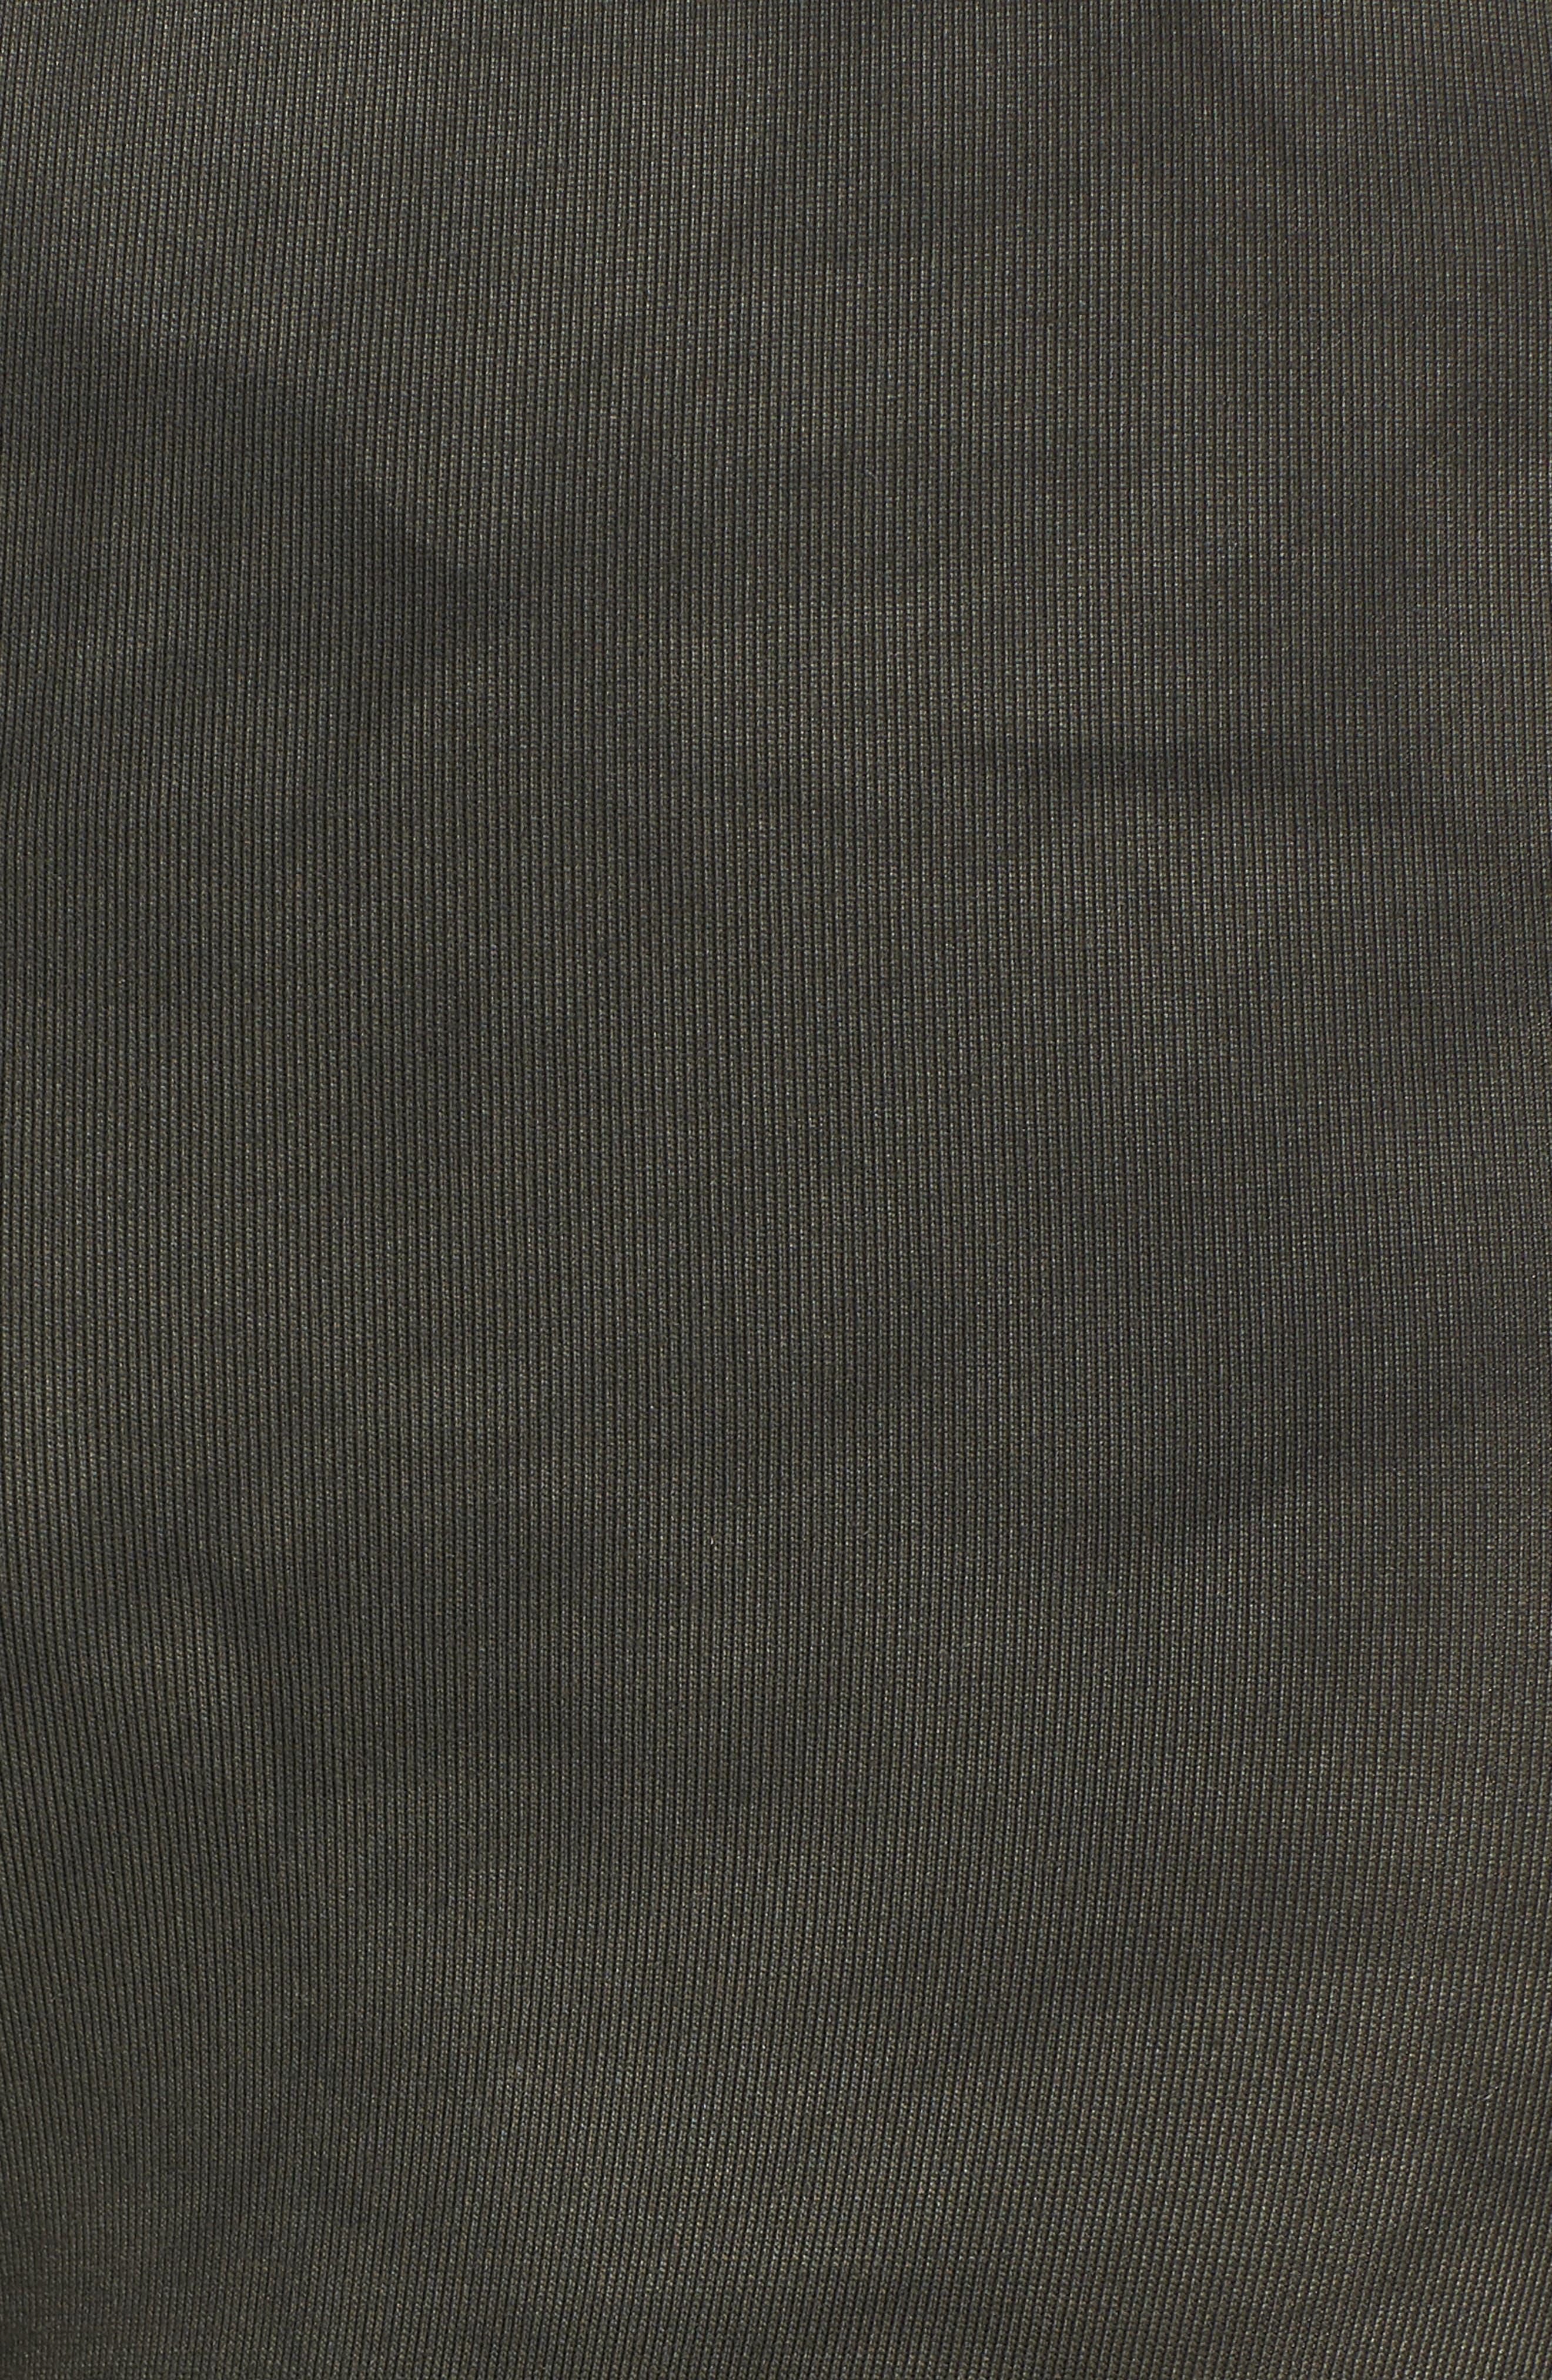 Kiely Ribbed Cuff Leggings,                             Alternate thumbnail 14, color,